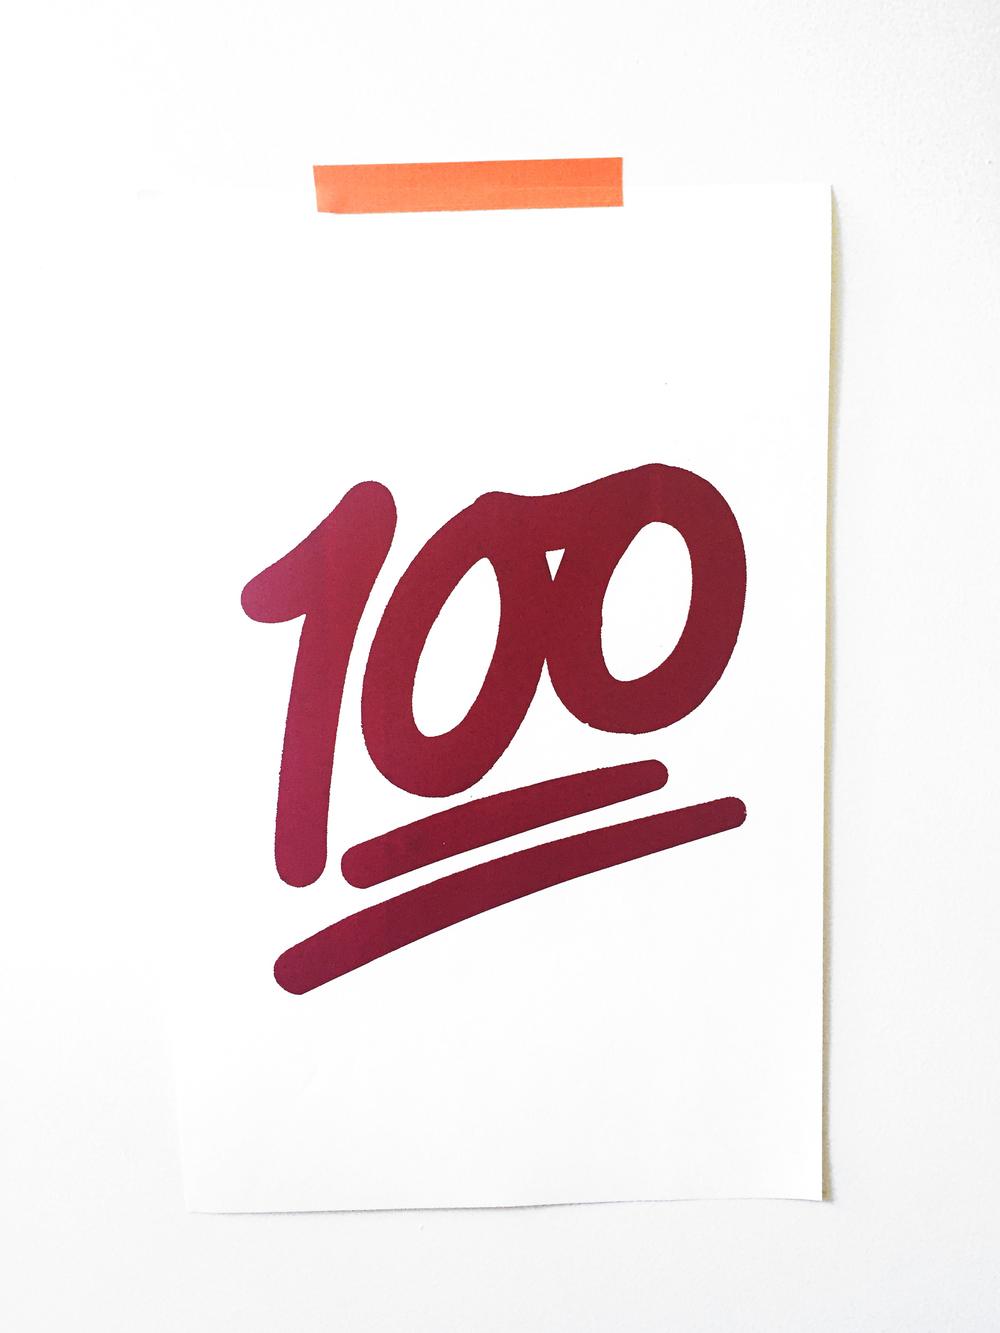 KEEP IT 100.jpg